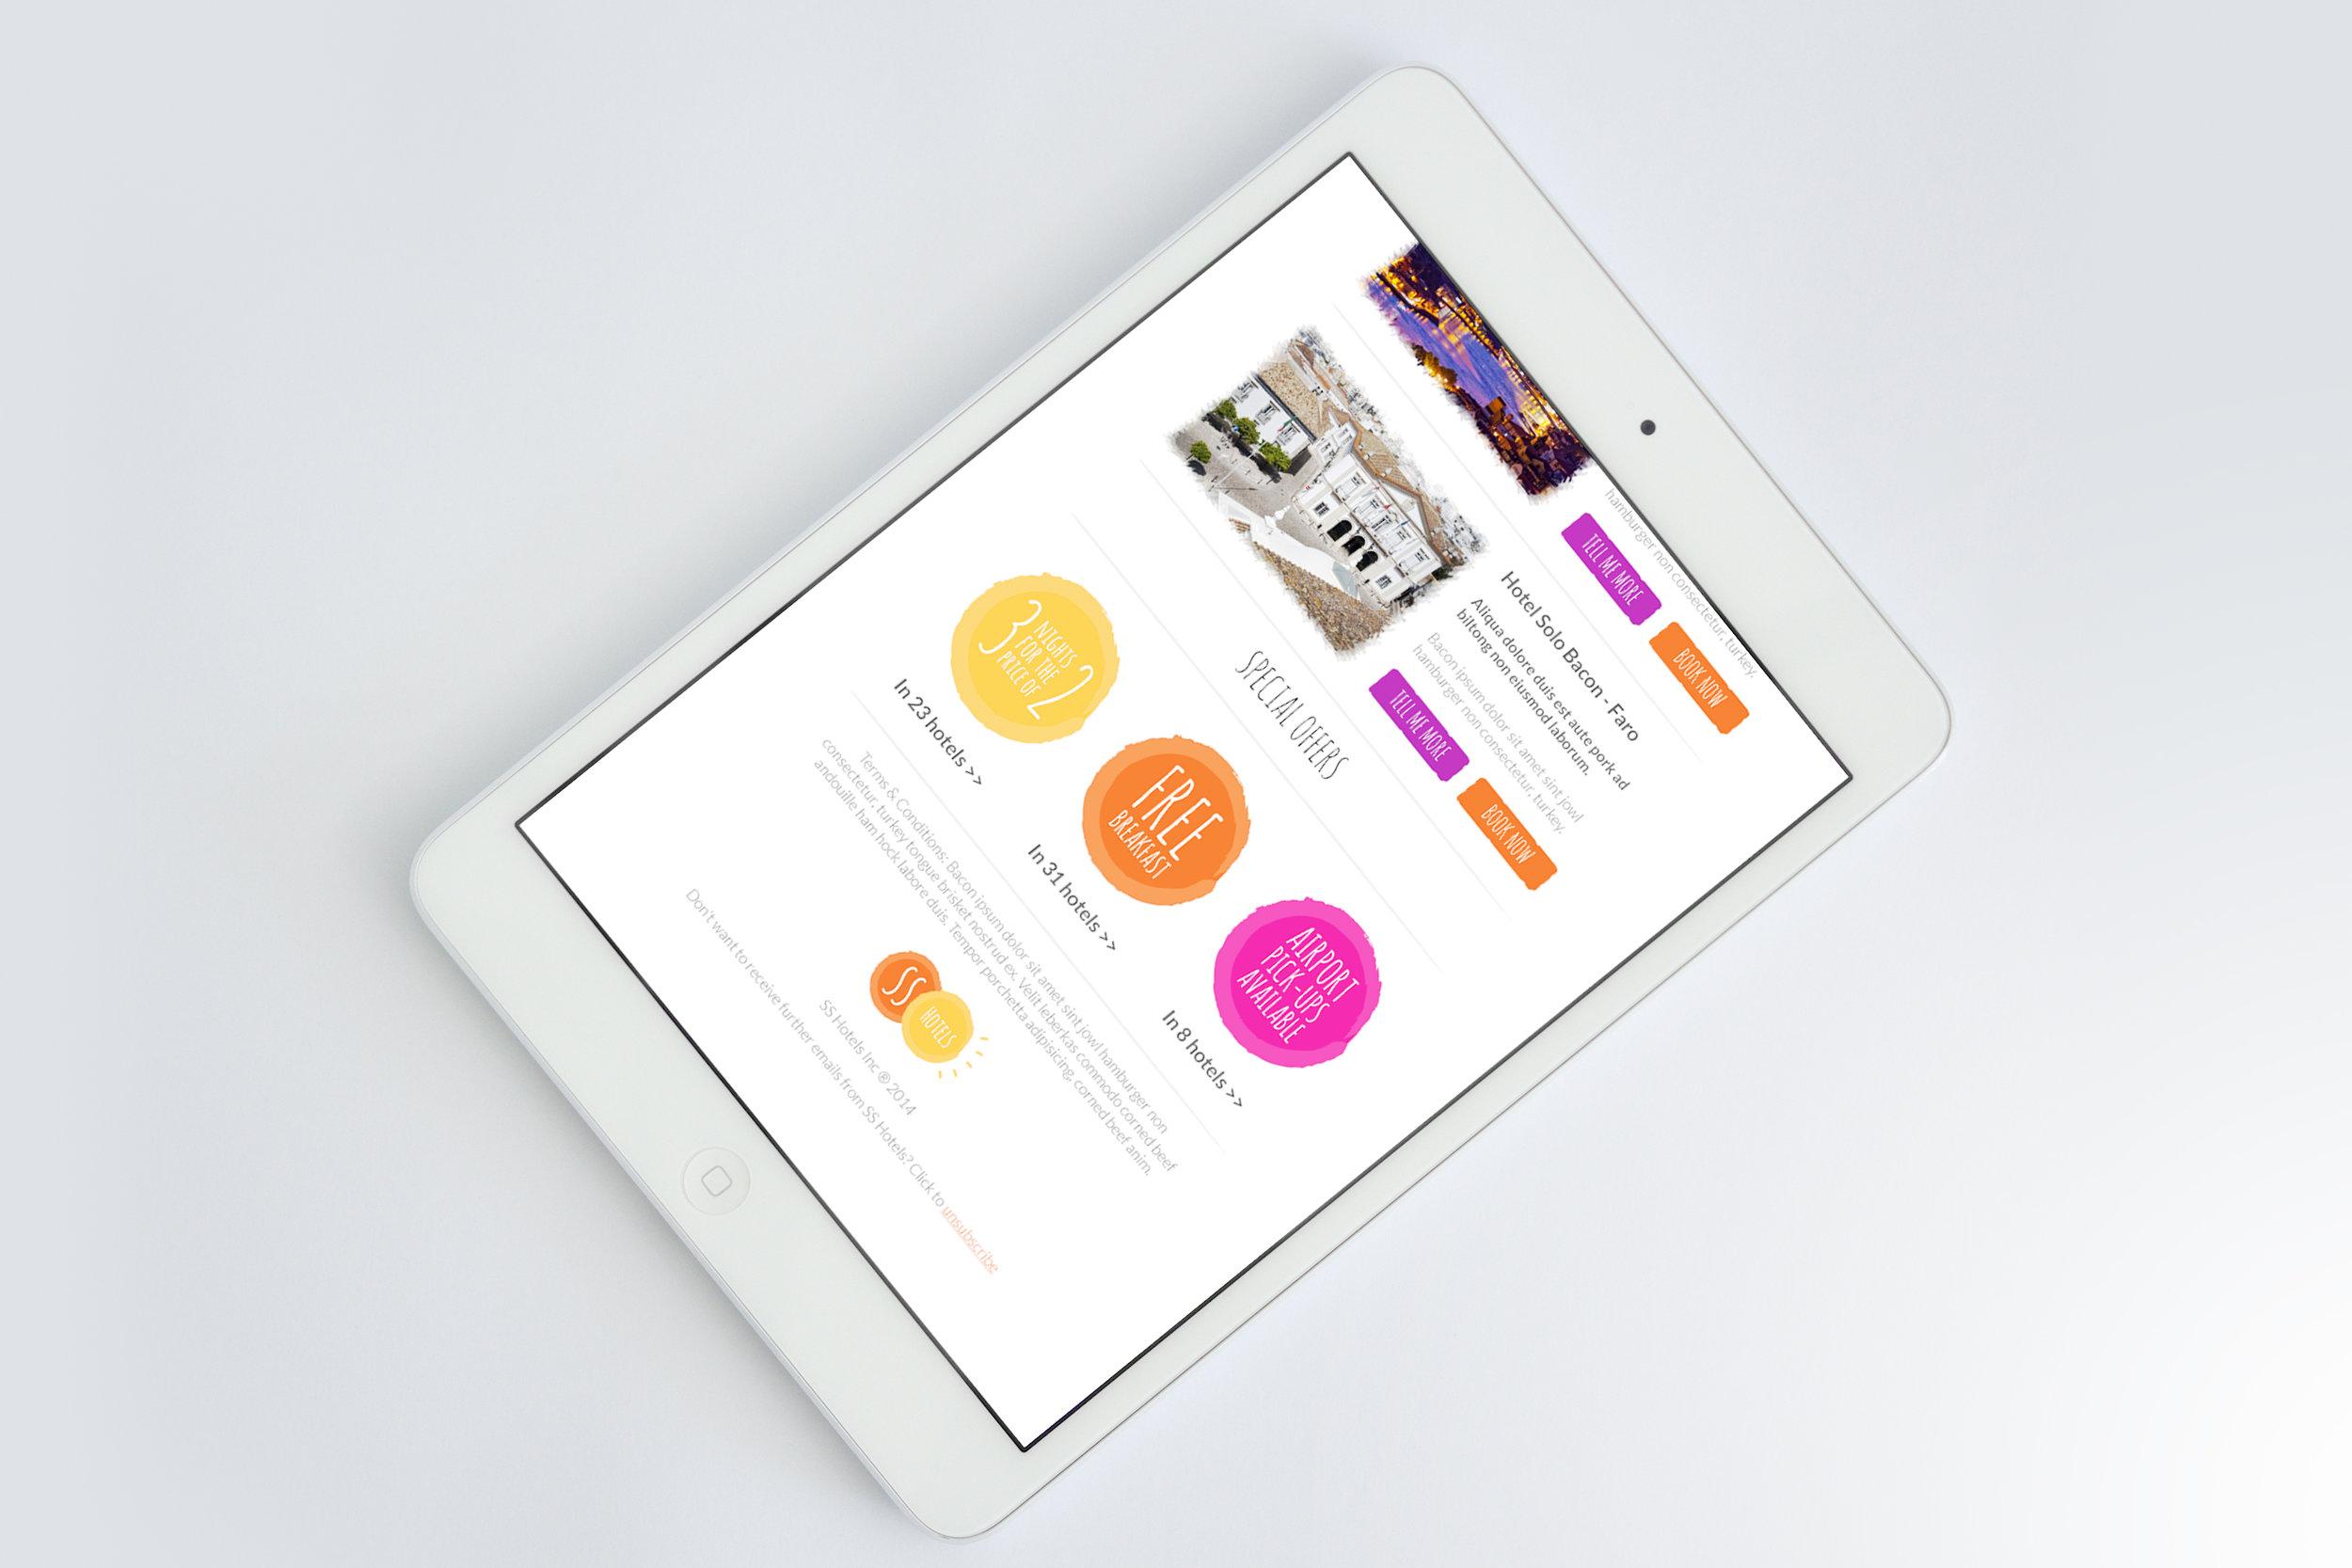 SS Hotels Emailer - iPad Mockup 3.jpg